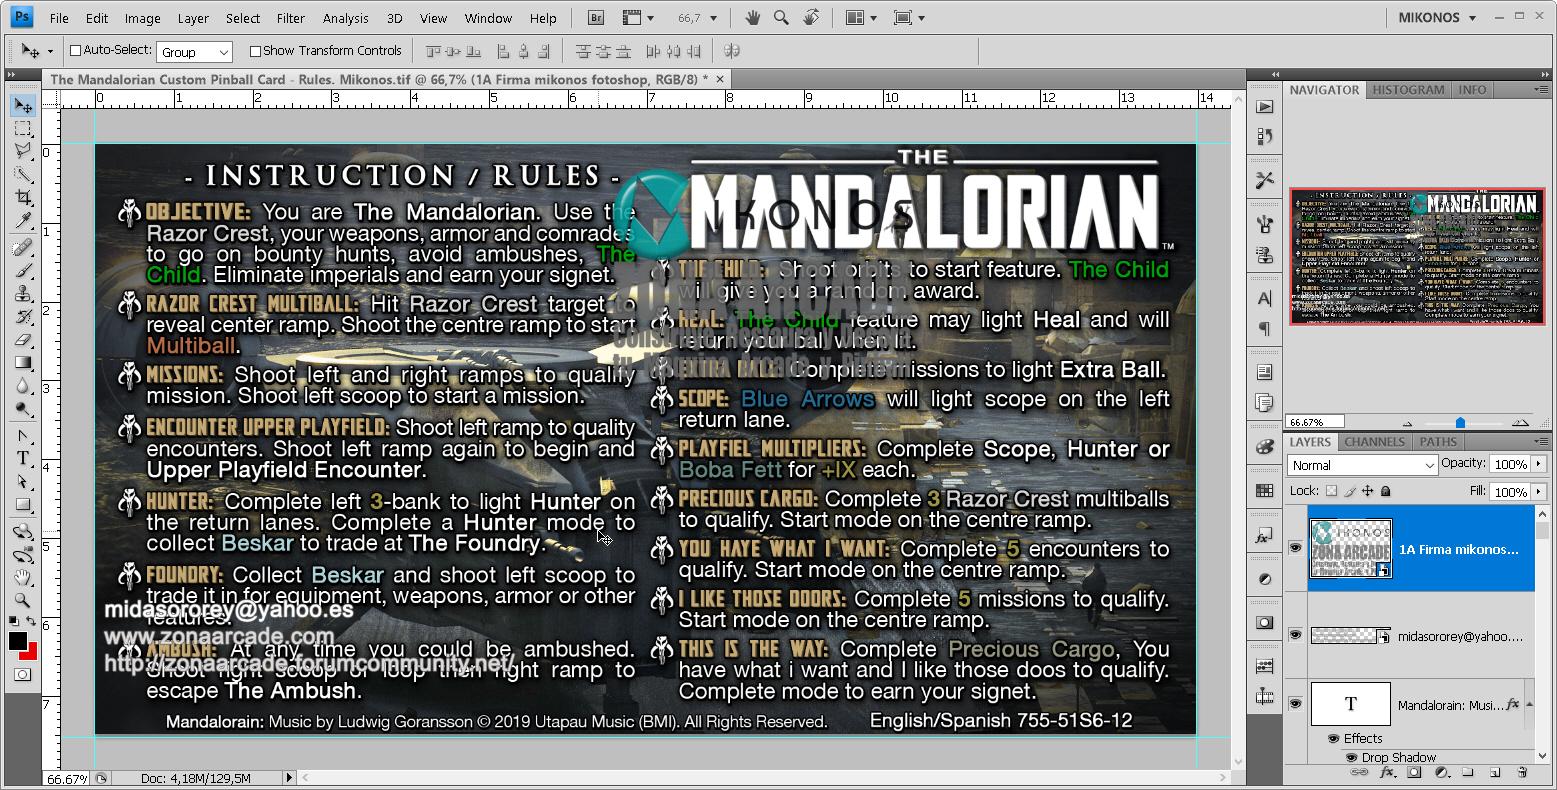 The-Mandalorian-Stern-Pinball-Card-Customized-Rules-Mikonos1